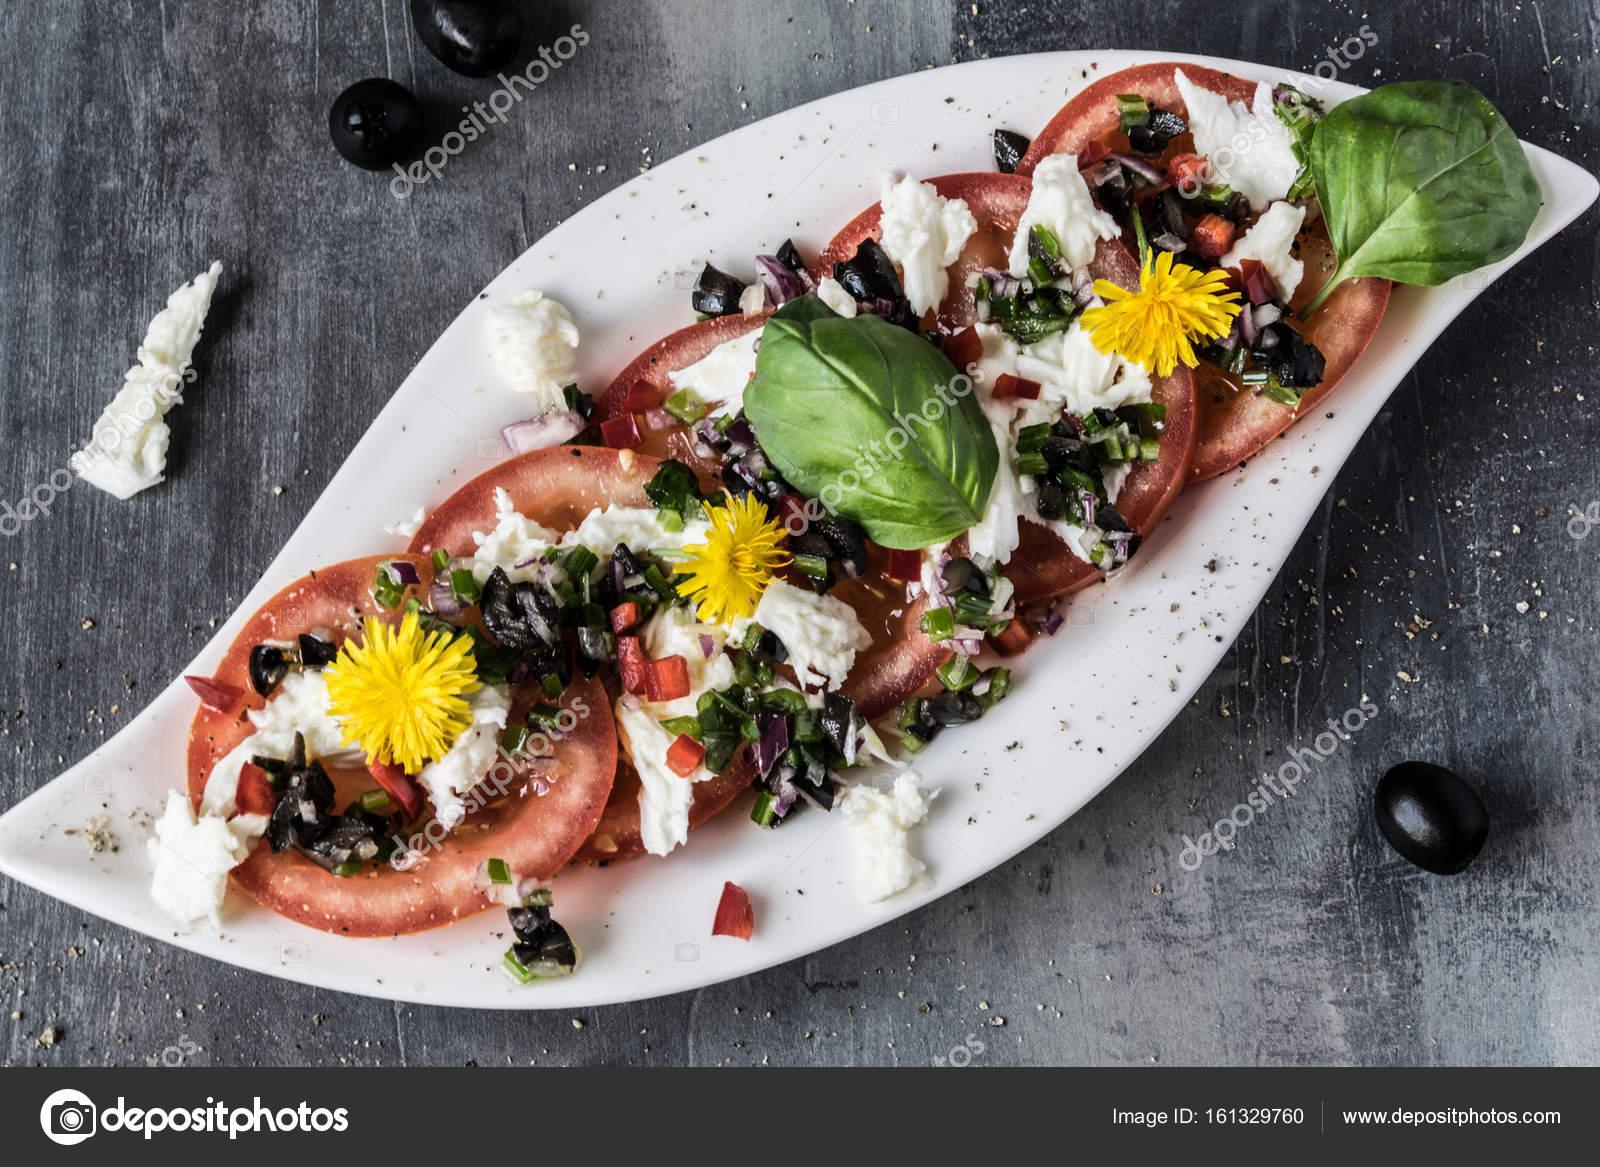 Kiraz Dünyası: Hellim Peynirli Salata